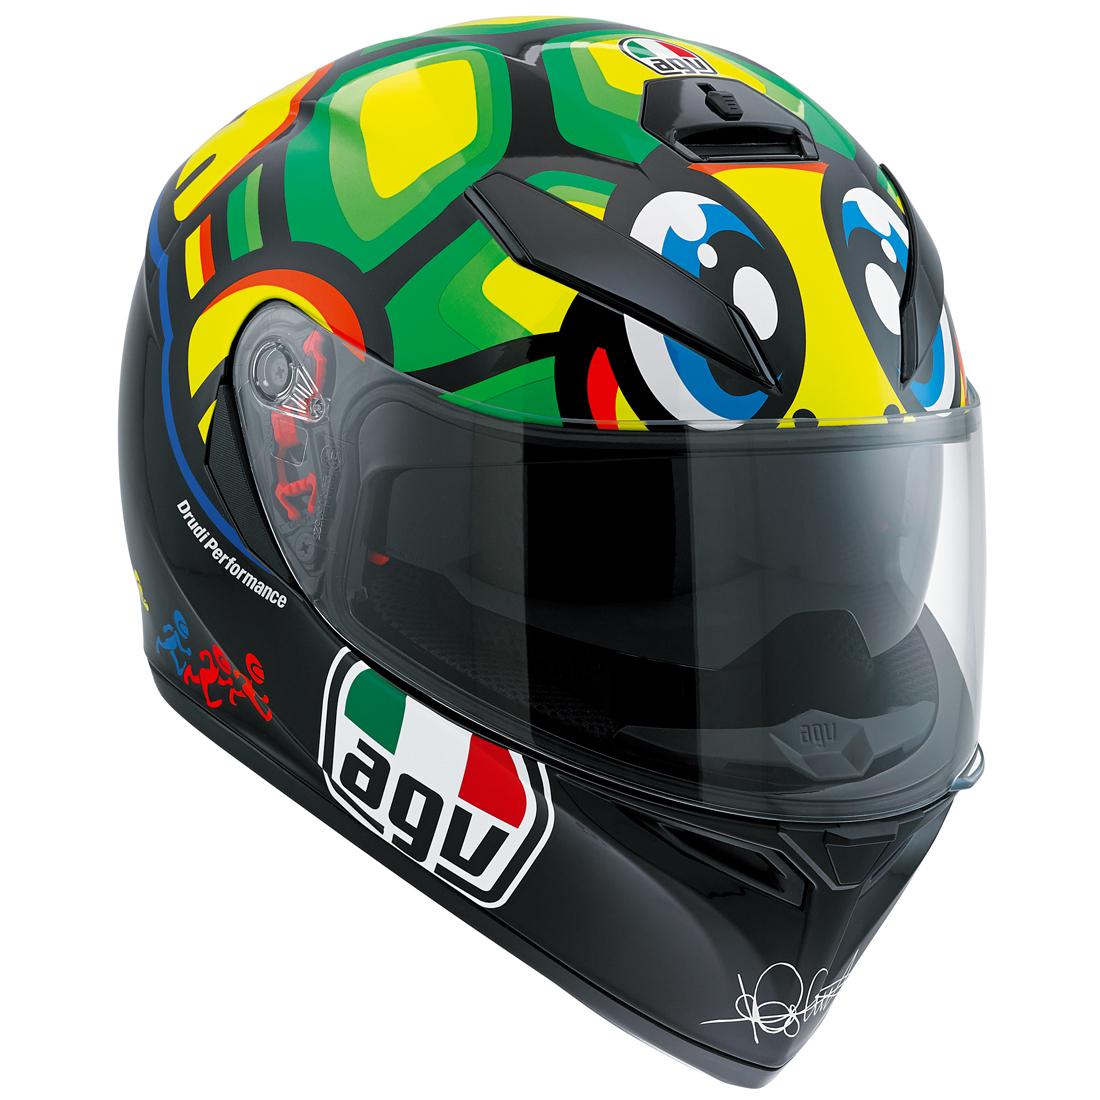 AGV(エージーブイ) バイク用ヘルメット フルフェイス K-3 SV TARTARUGA MPLK (タルタルーガ) Mサイズ (57-58cm) 030190MF003-M